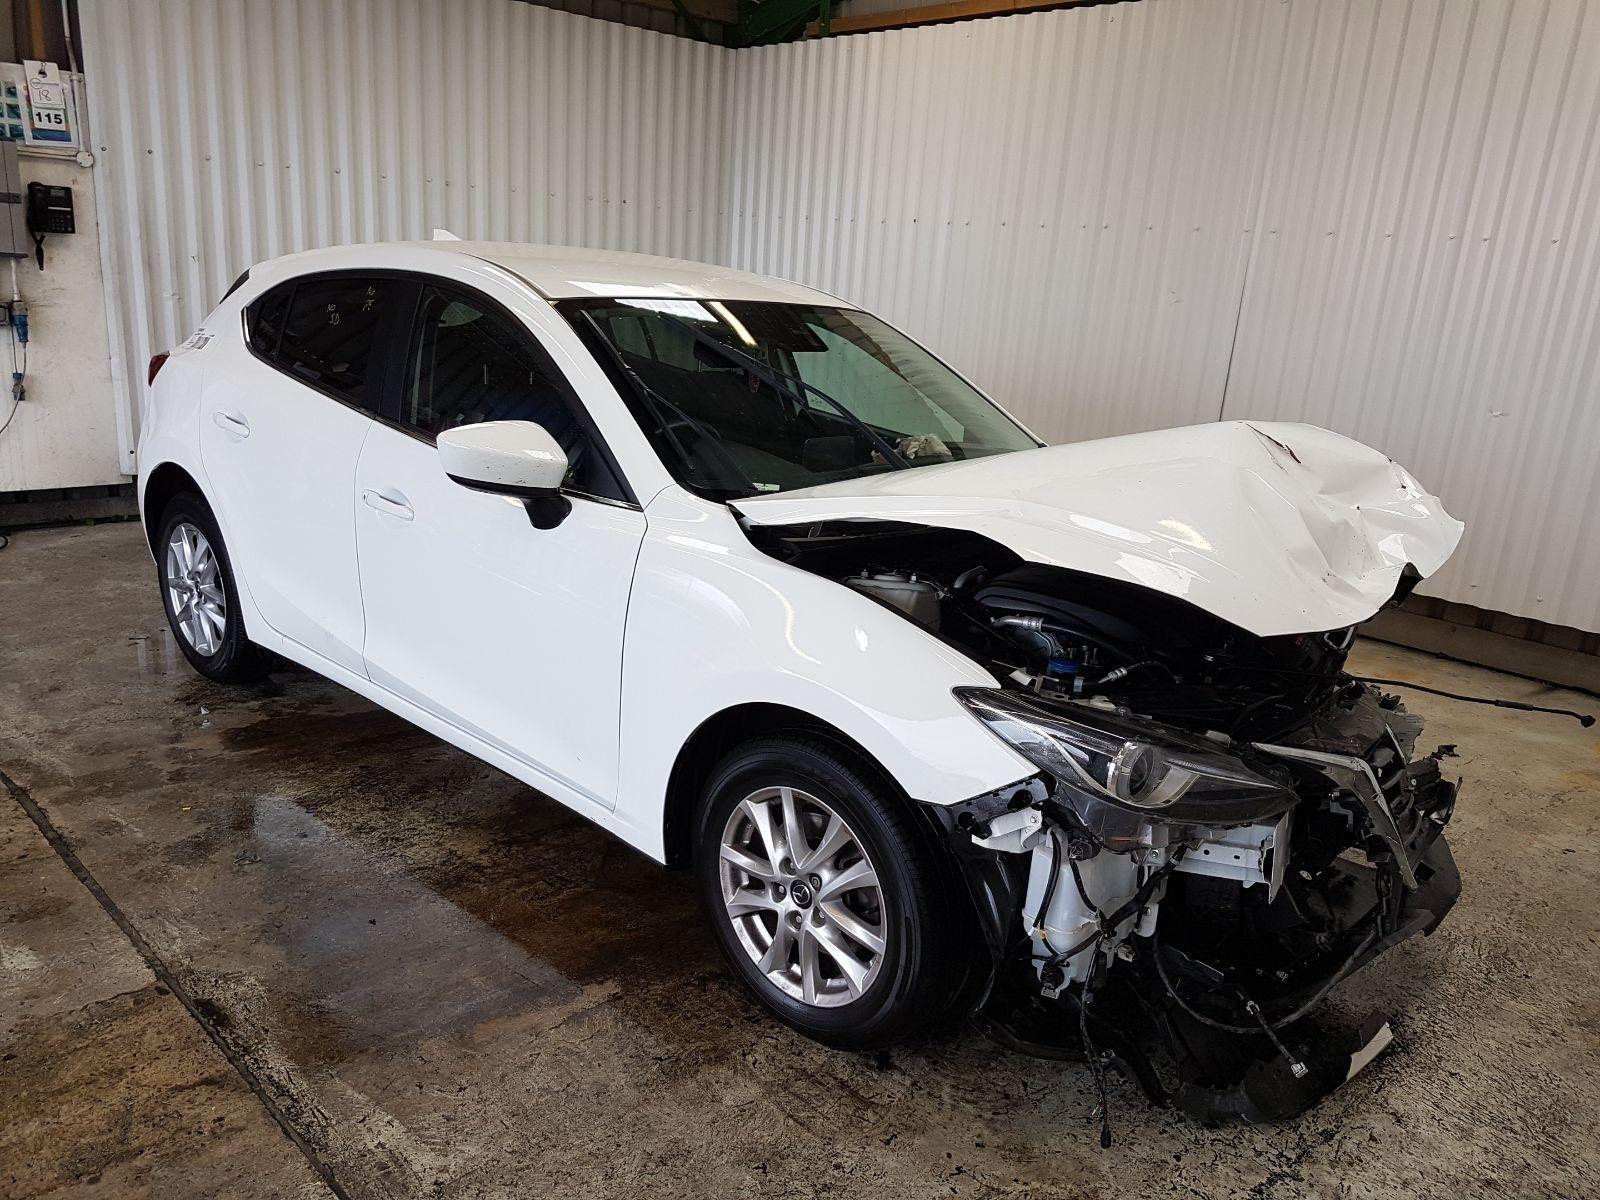 Mazda 3 2016 On SE-L Nav 5 Door Hatchback